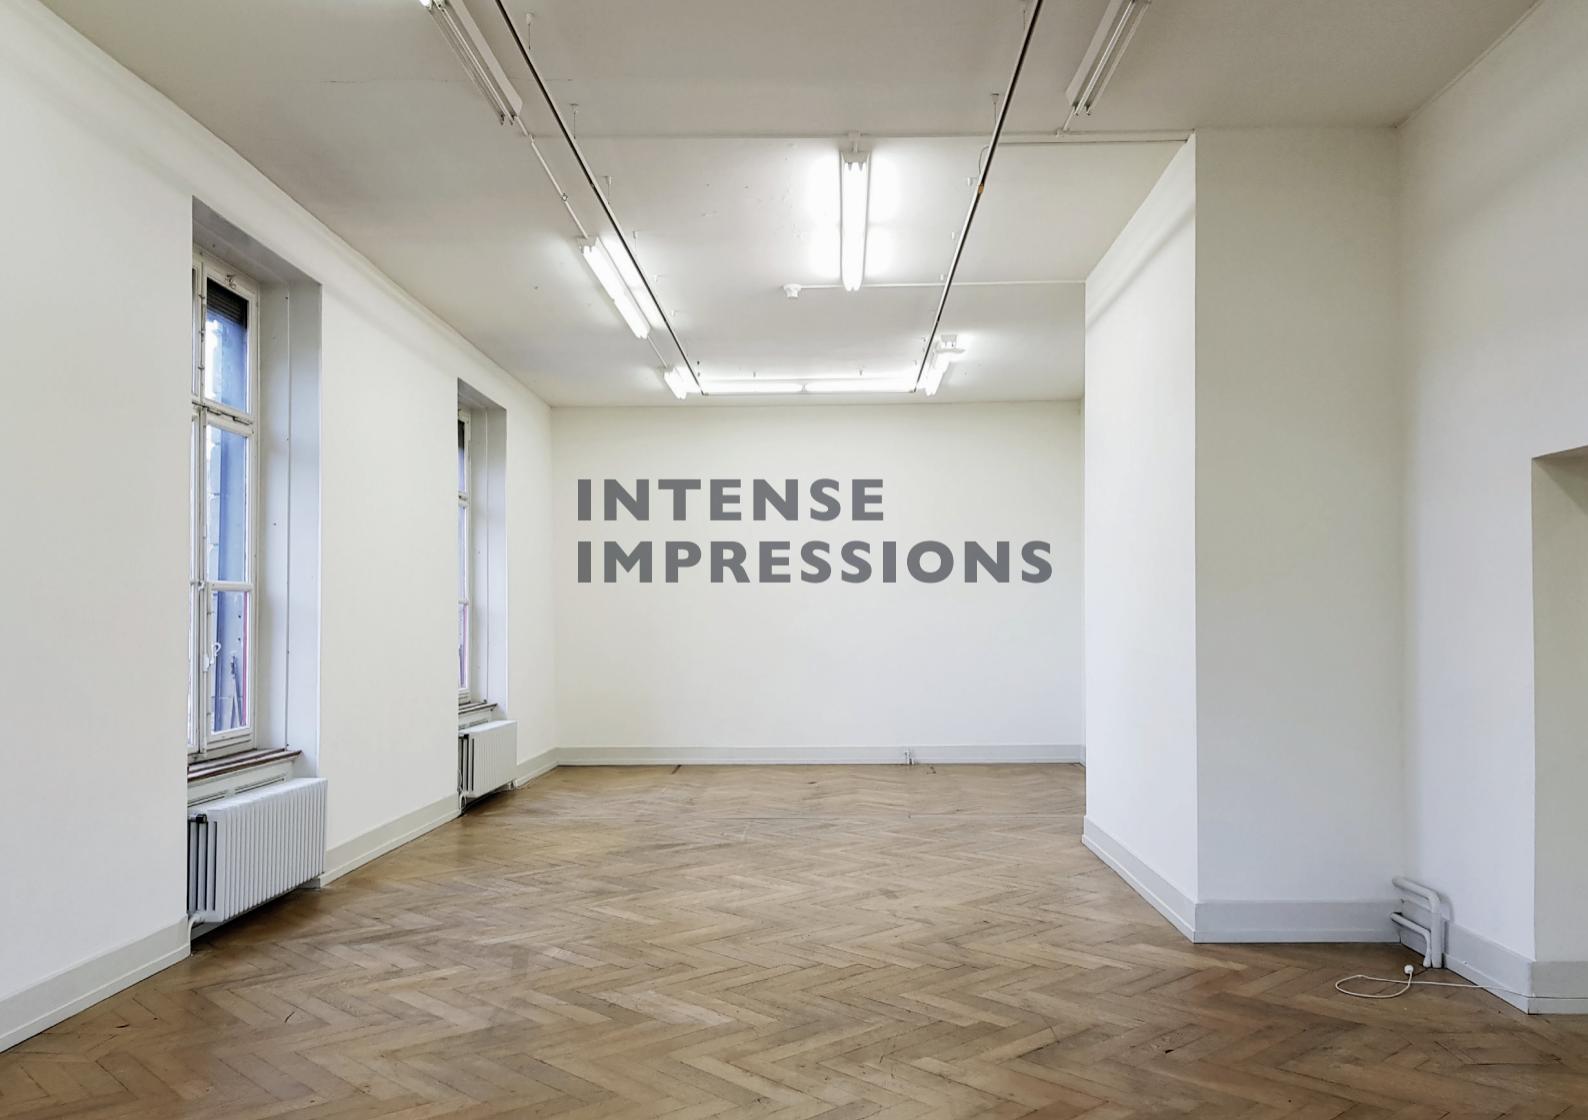 INTENSE IMPRESSIONS